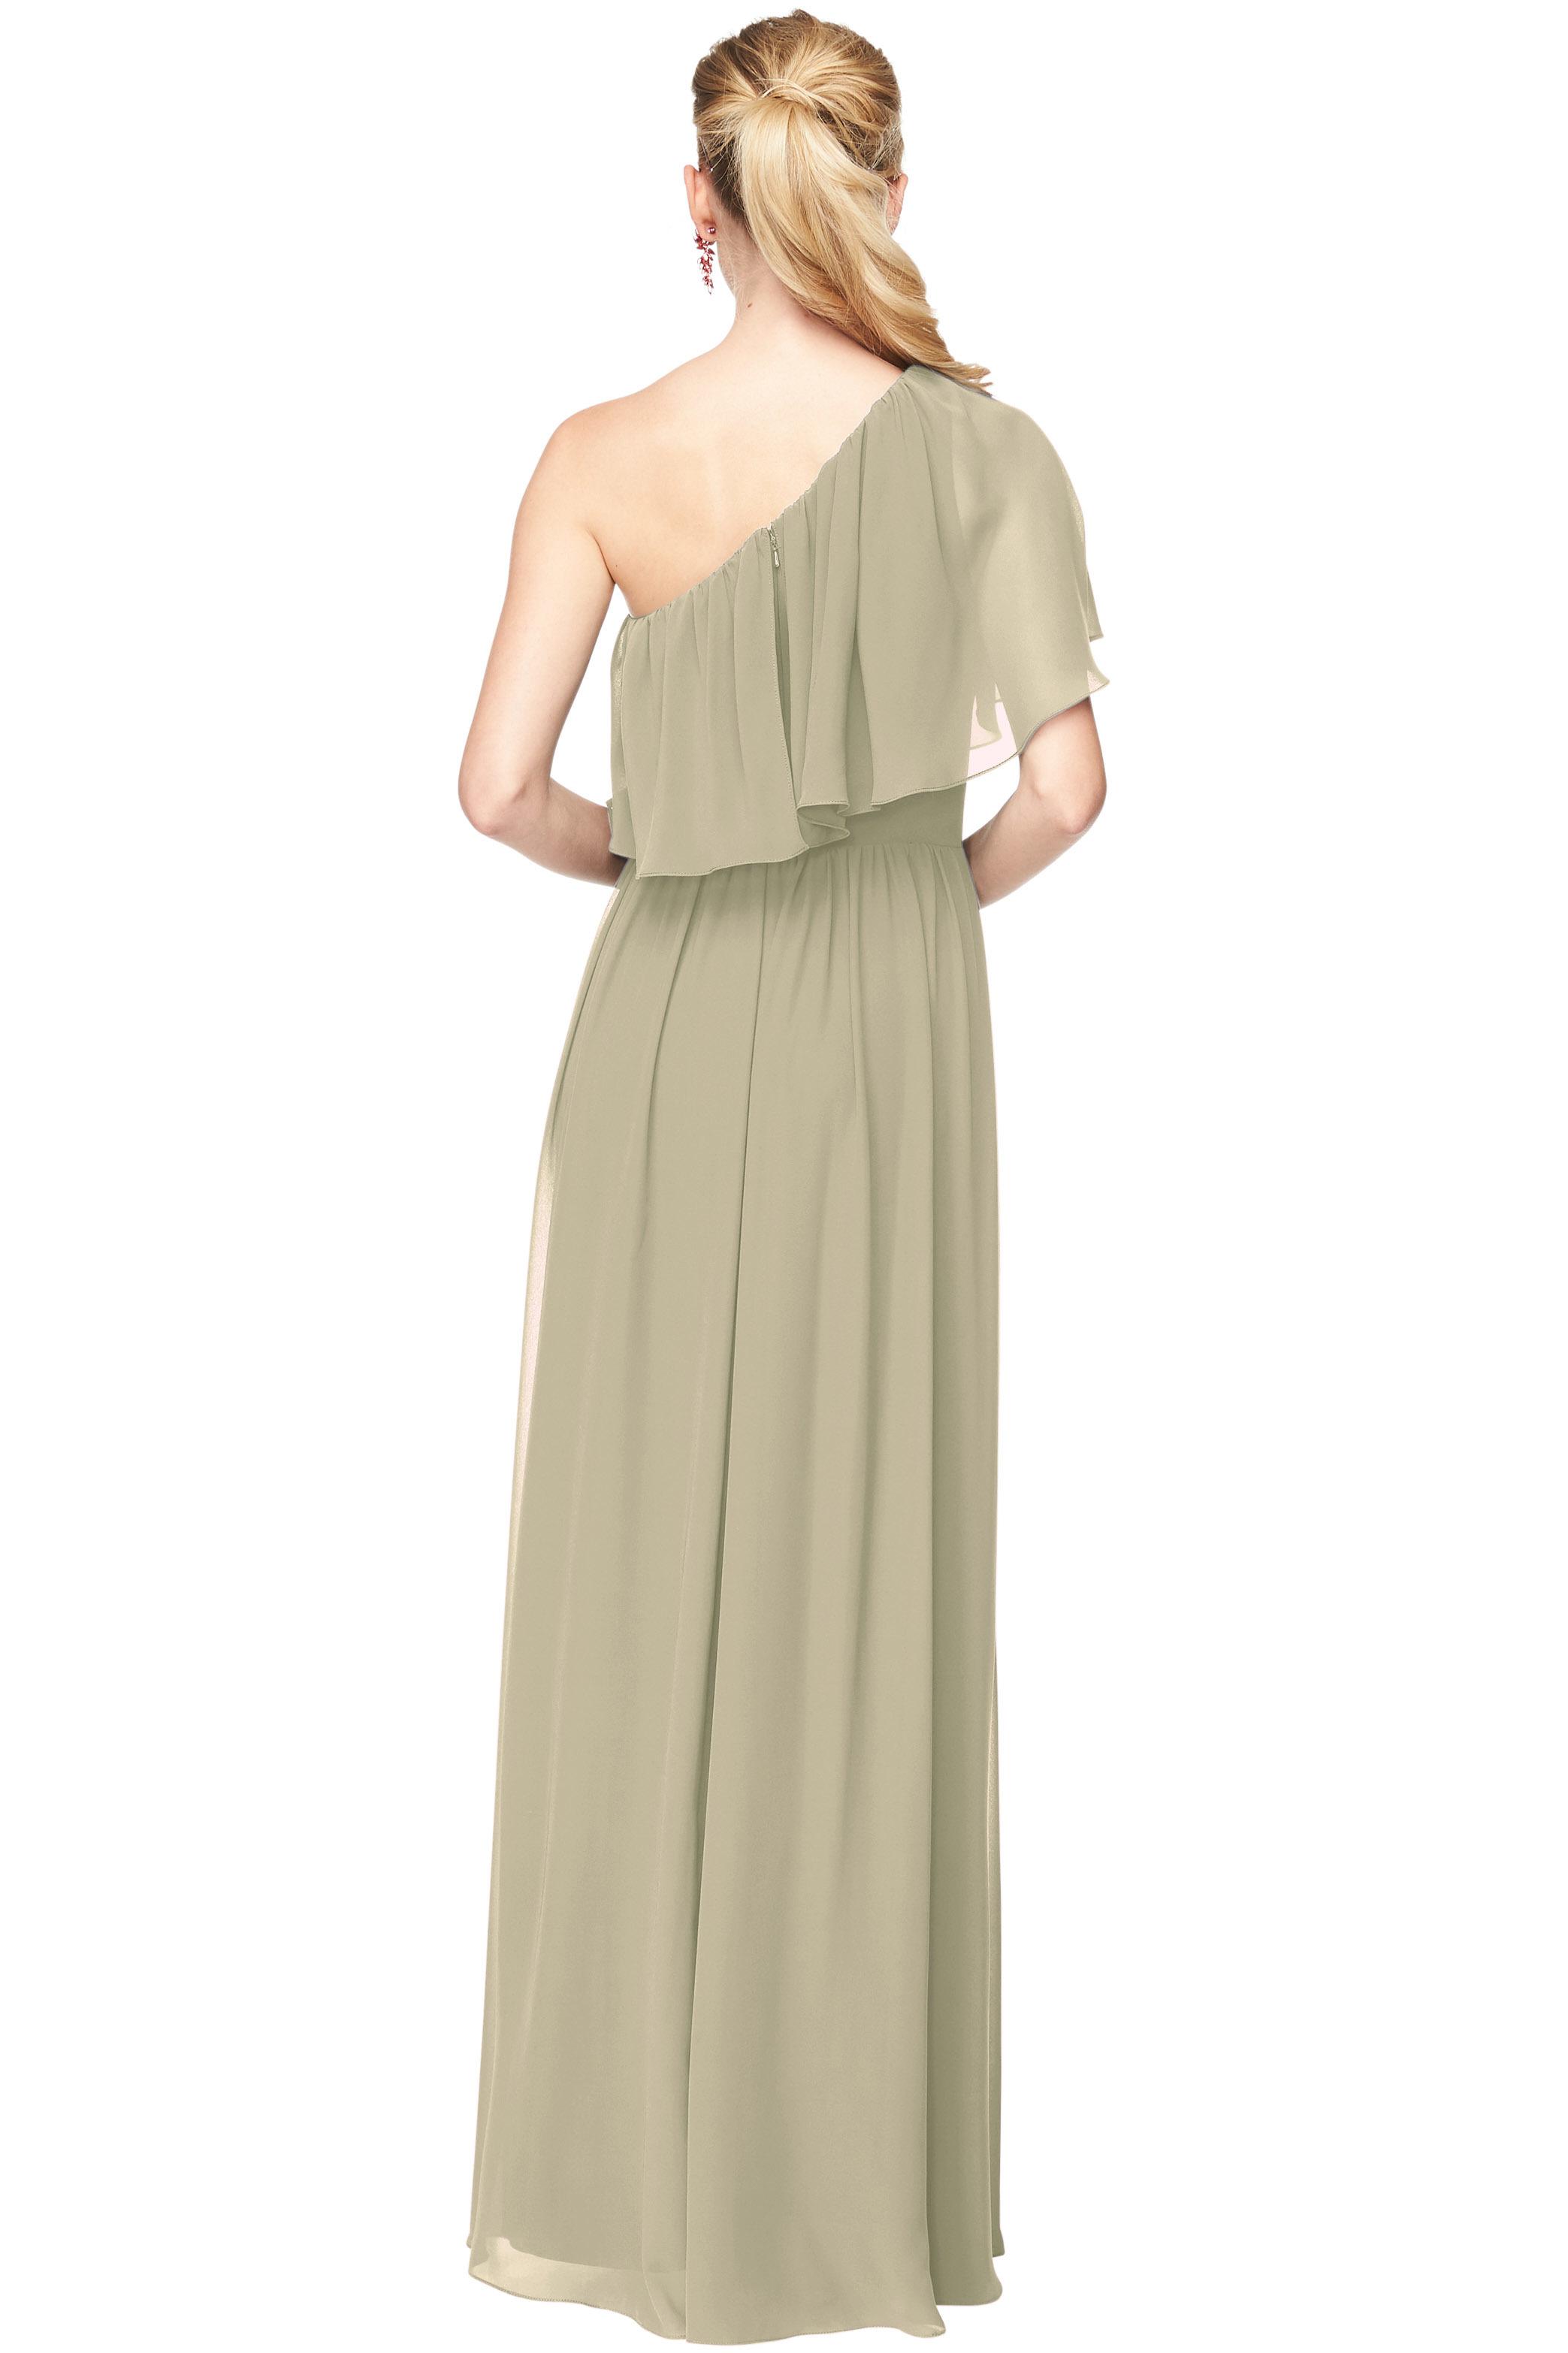 Bill Levkoff PISTACHIO Chiffon One Shoulder A-Line gown, $184.00 Back